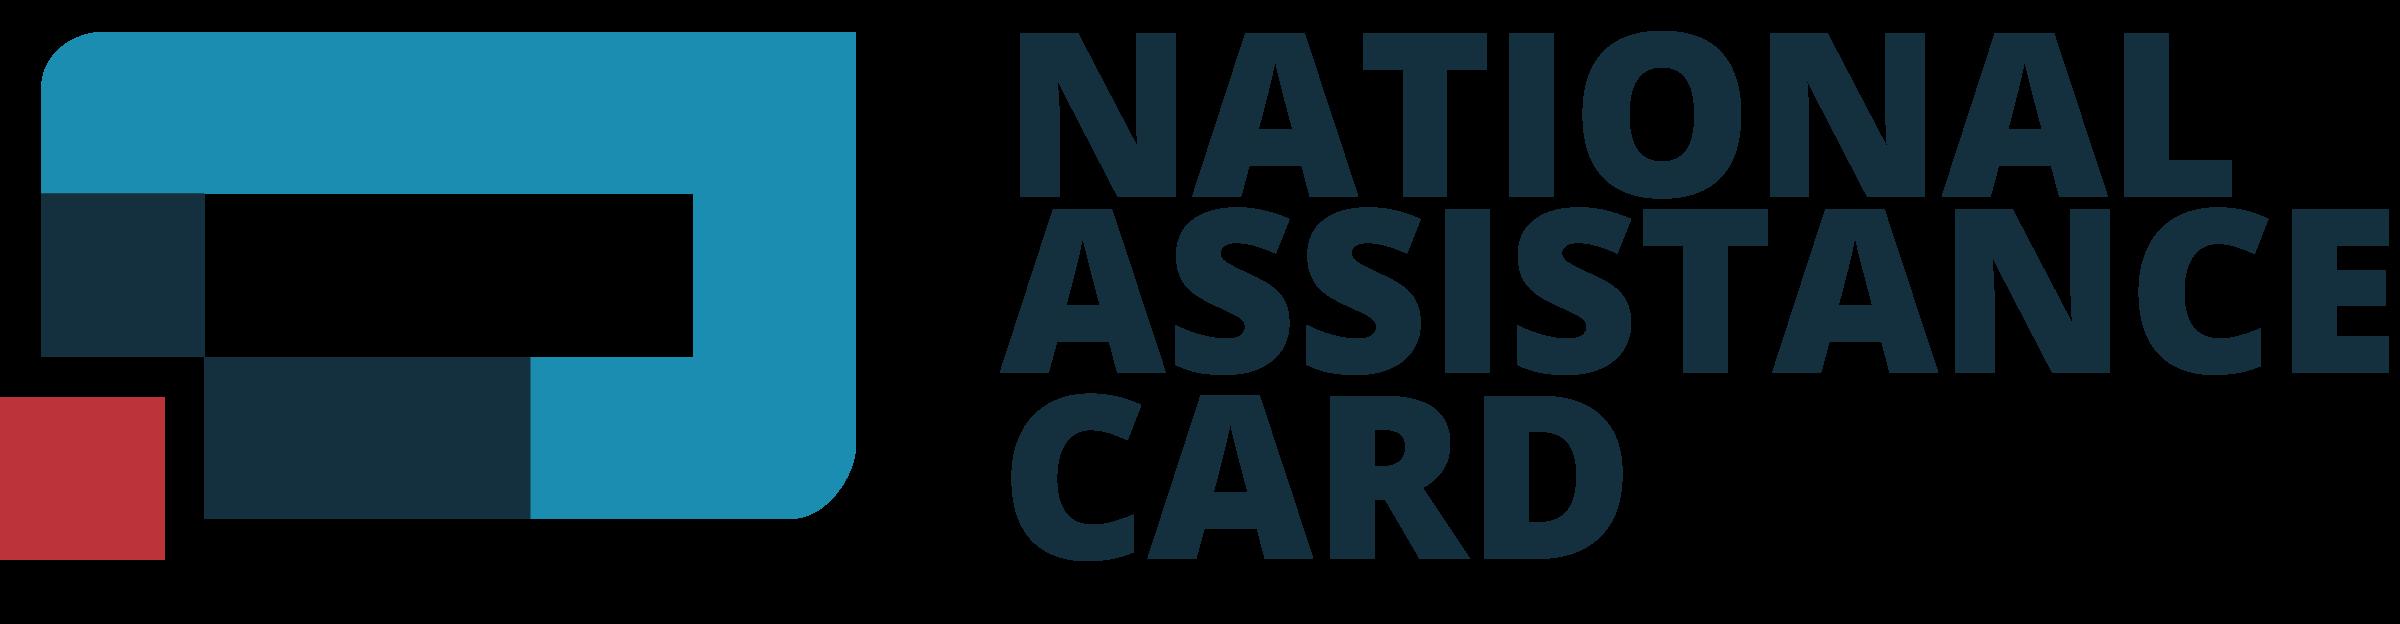 national assistance card logo